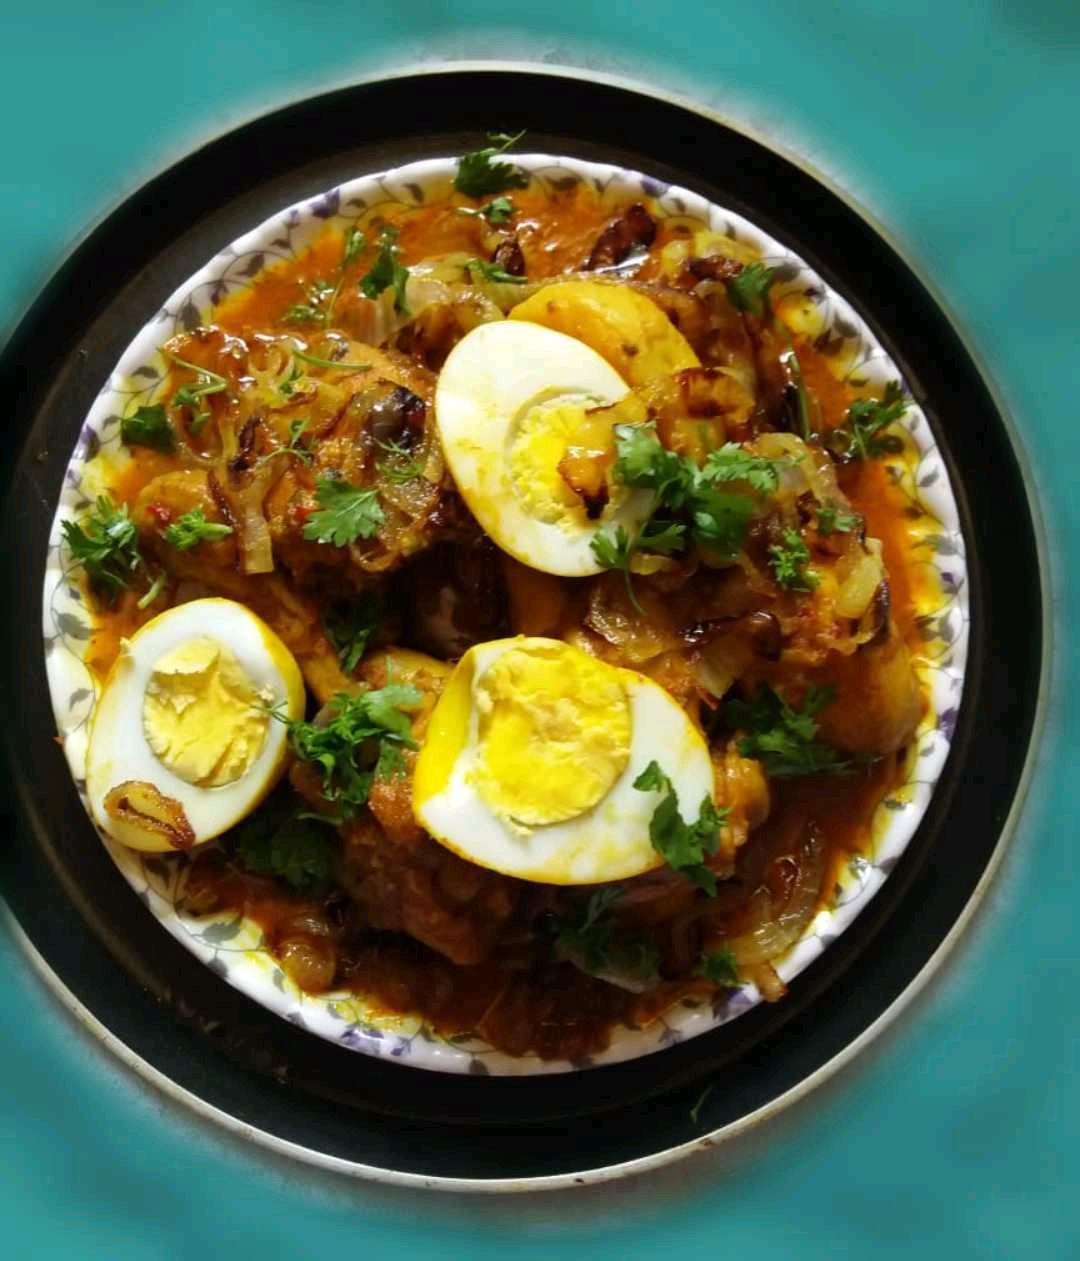 Chicken Dak Bunglow...An Authentic Lost Recipe